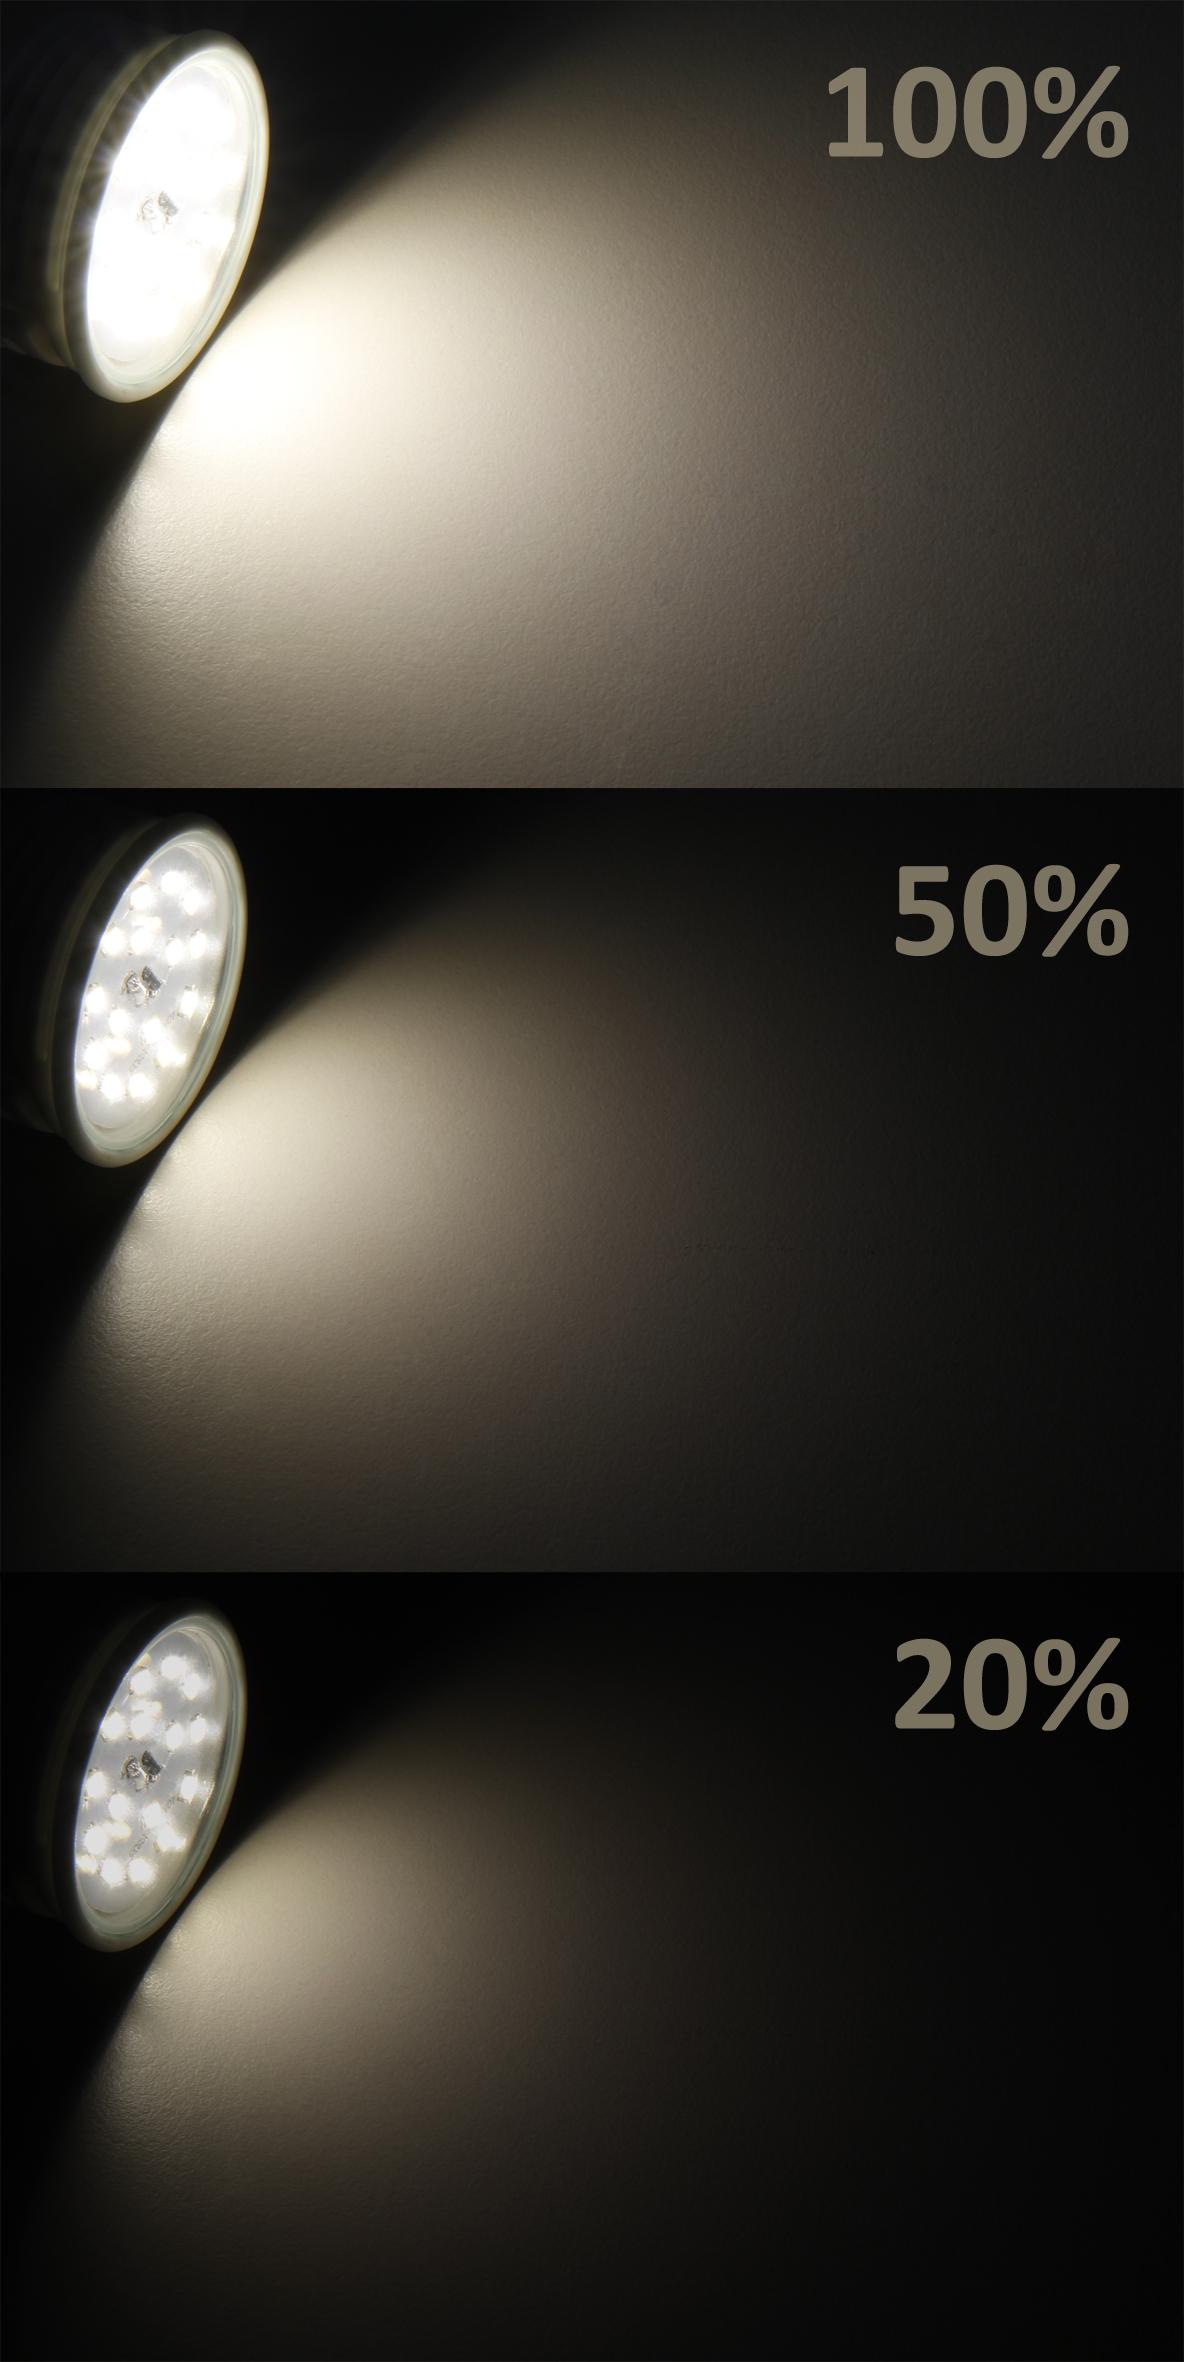 LED-Modul McShine, 5W, 400 Lumen, 230V, 50x23mm, warmweiß, 3000K, step-dimmbar